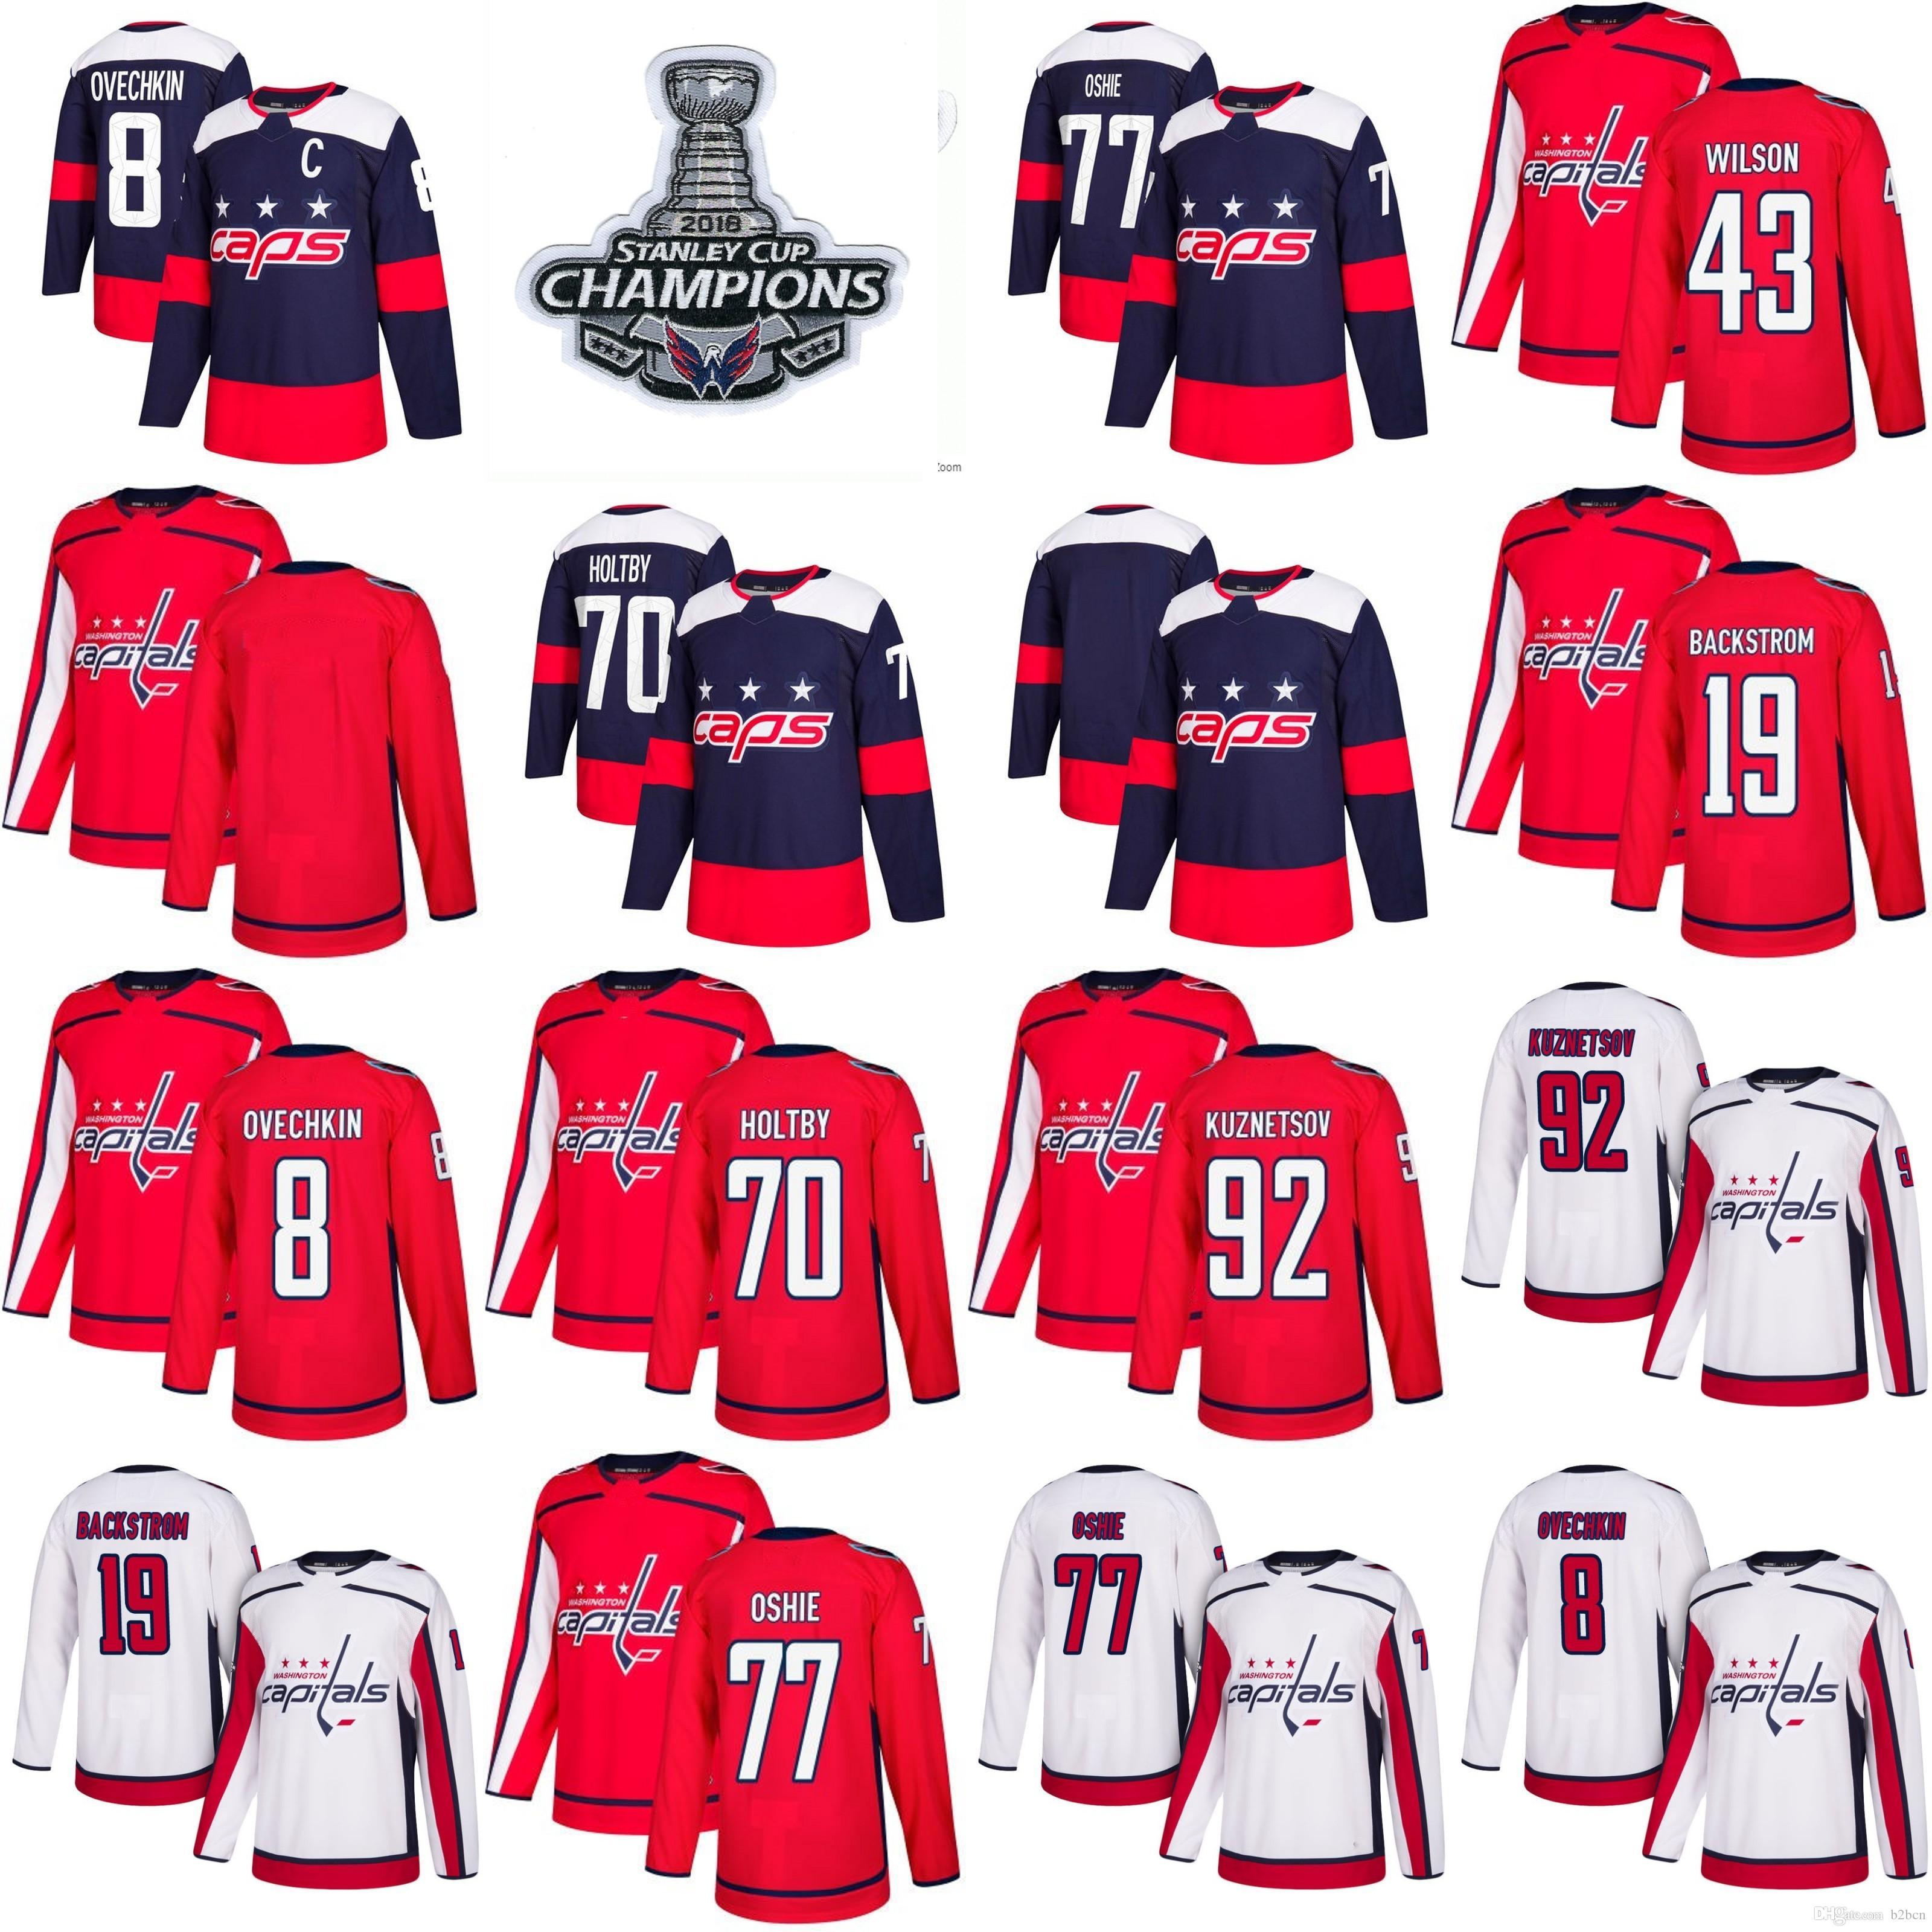 2019 2018 Stanley Cup Champions Youth Women Capitals 8 Alex Ovechkin 77 TJ  Oshie 70 Braden Holtby 92 Kuznetsov 43 Tom Wilson Backstrom Jerseys From  B2bcn 45b96408d